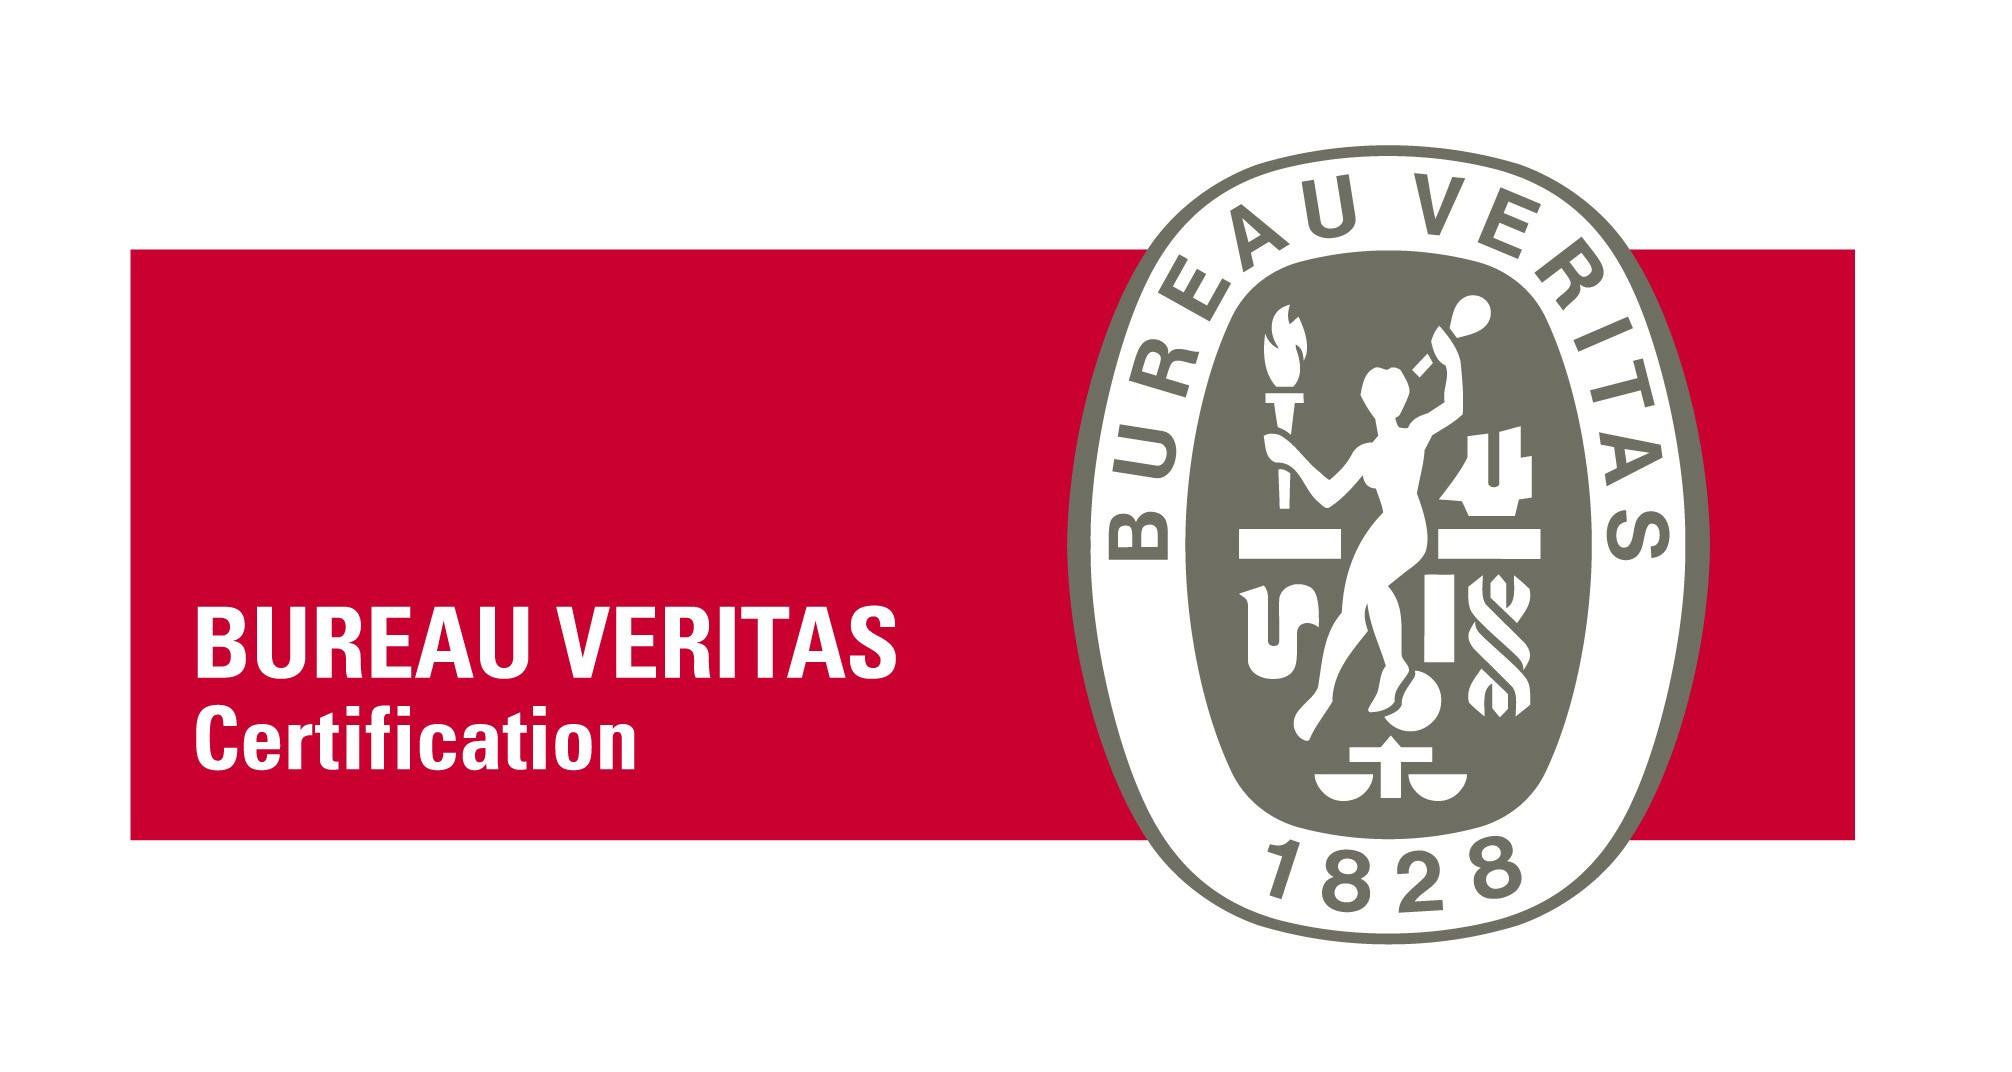 ISO 9001:2008 – Bureau Veritas